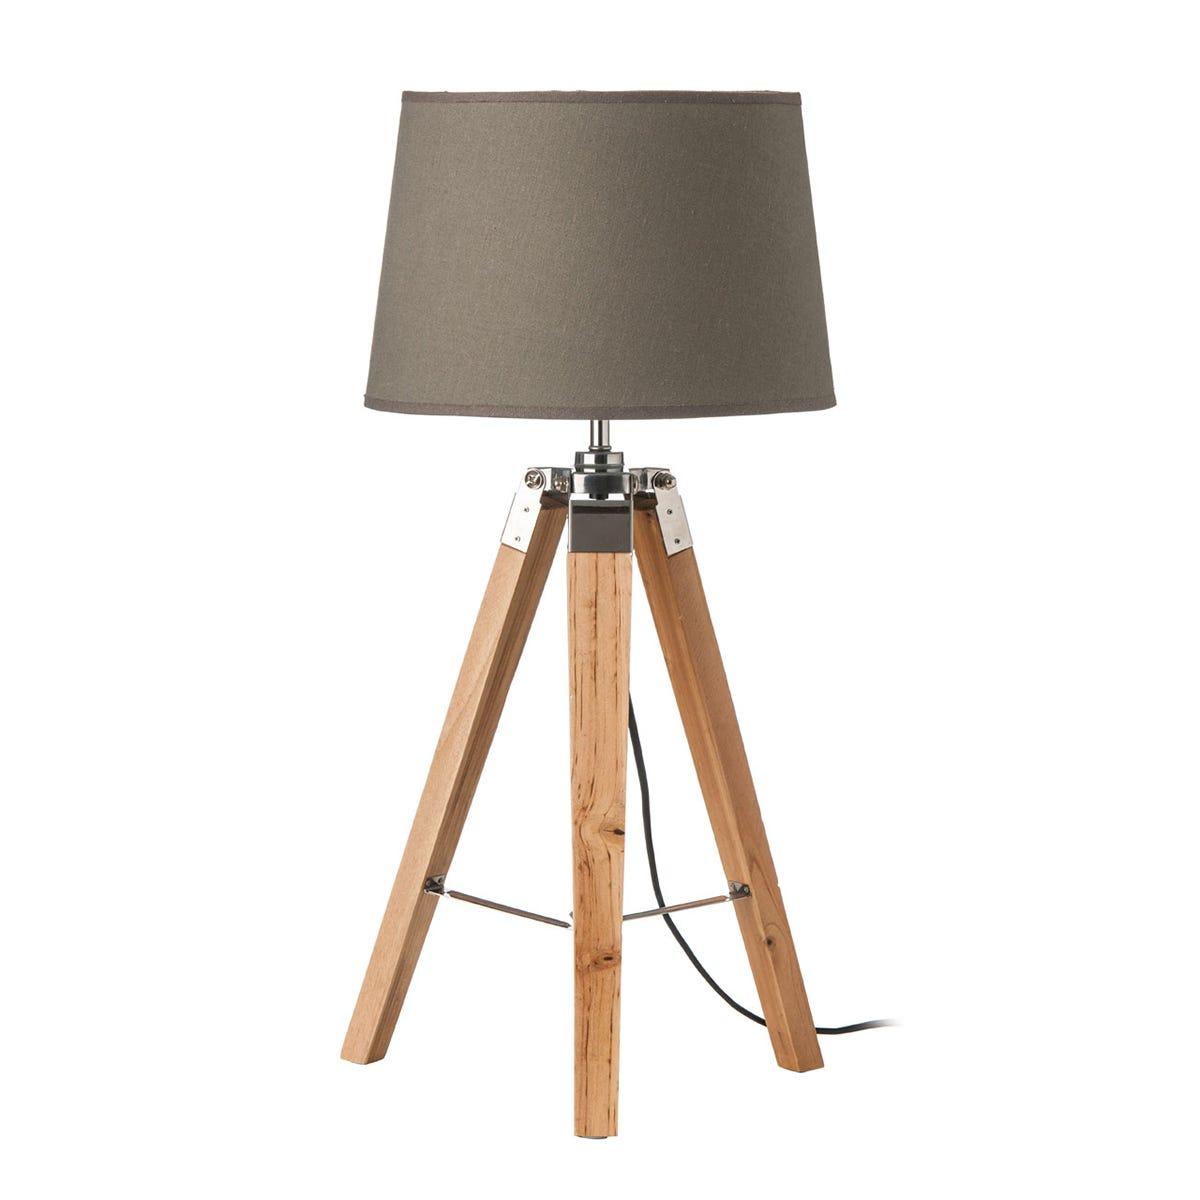 Premier Housewares Tripod Table Lamp with Grey Shade & Light Wood Base